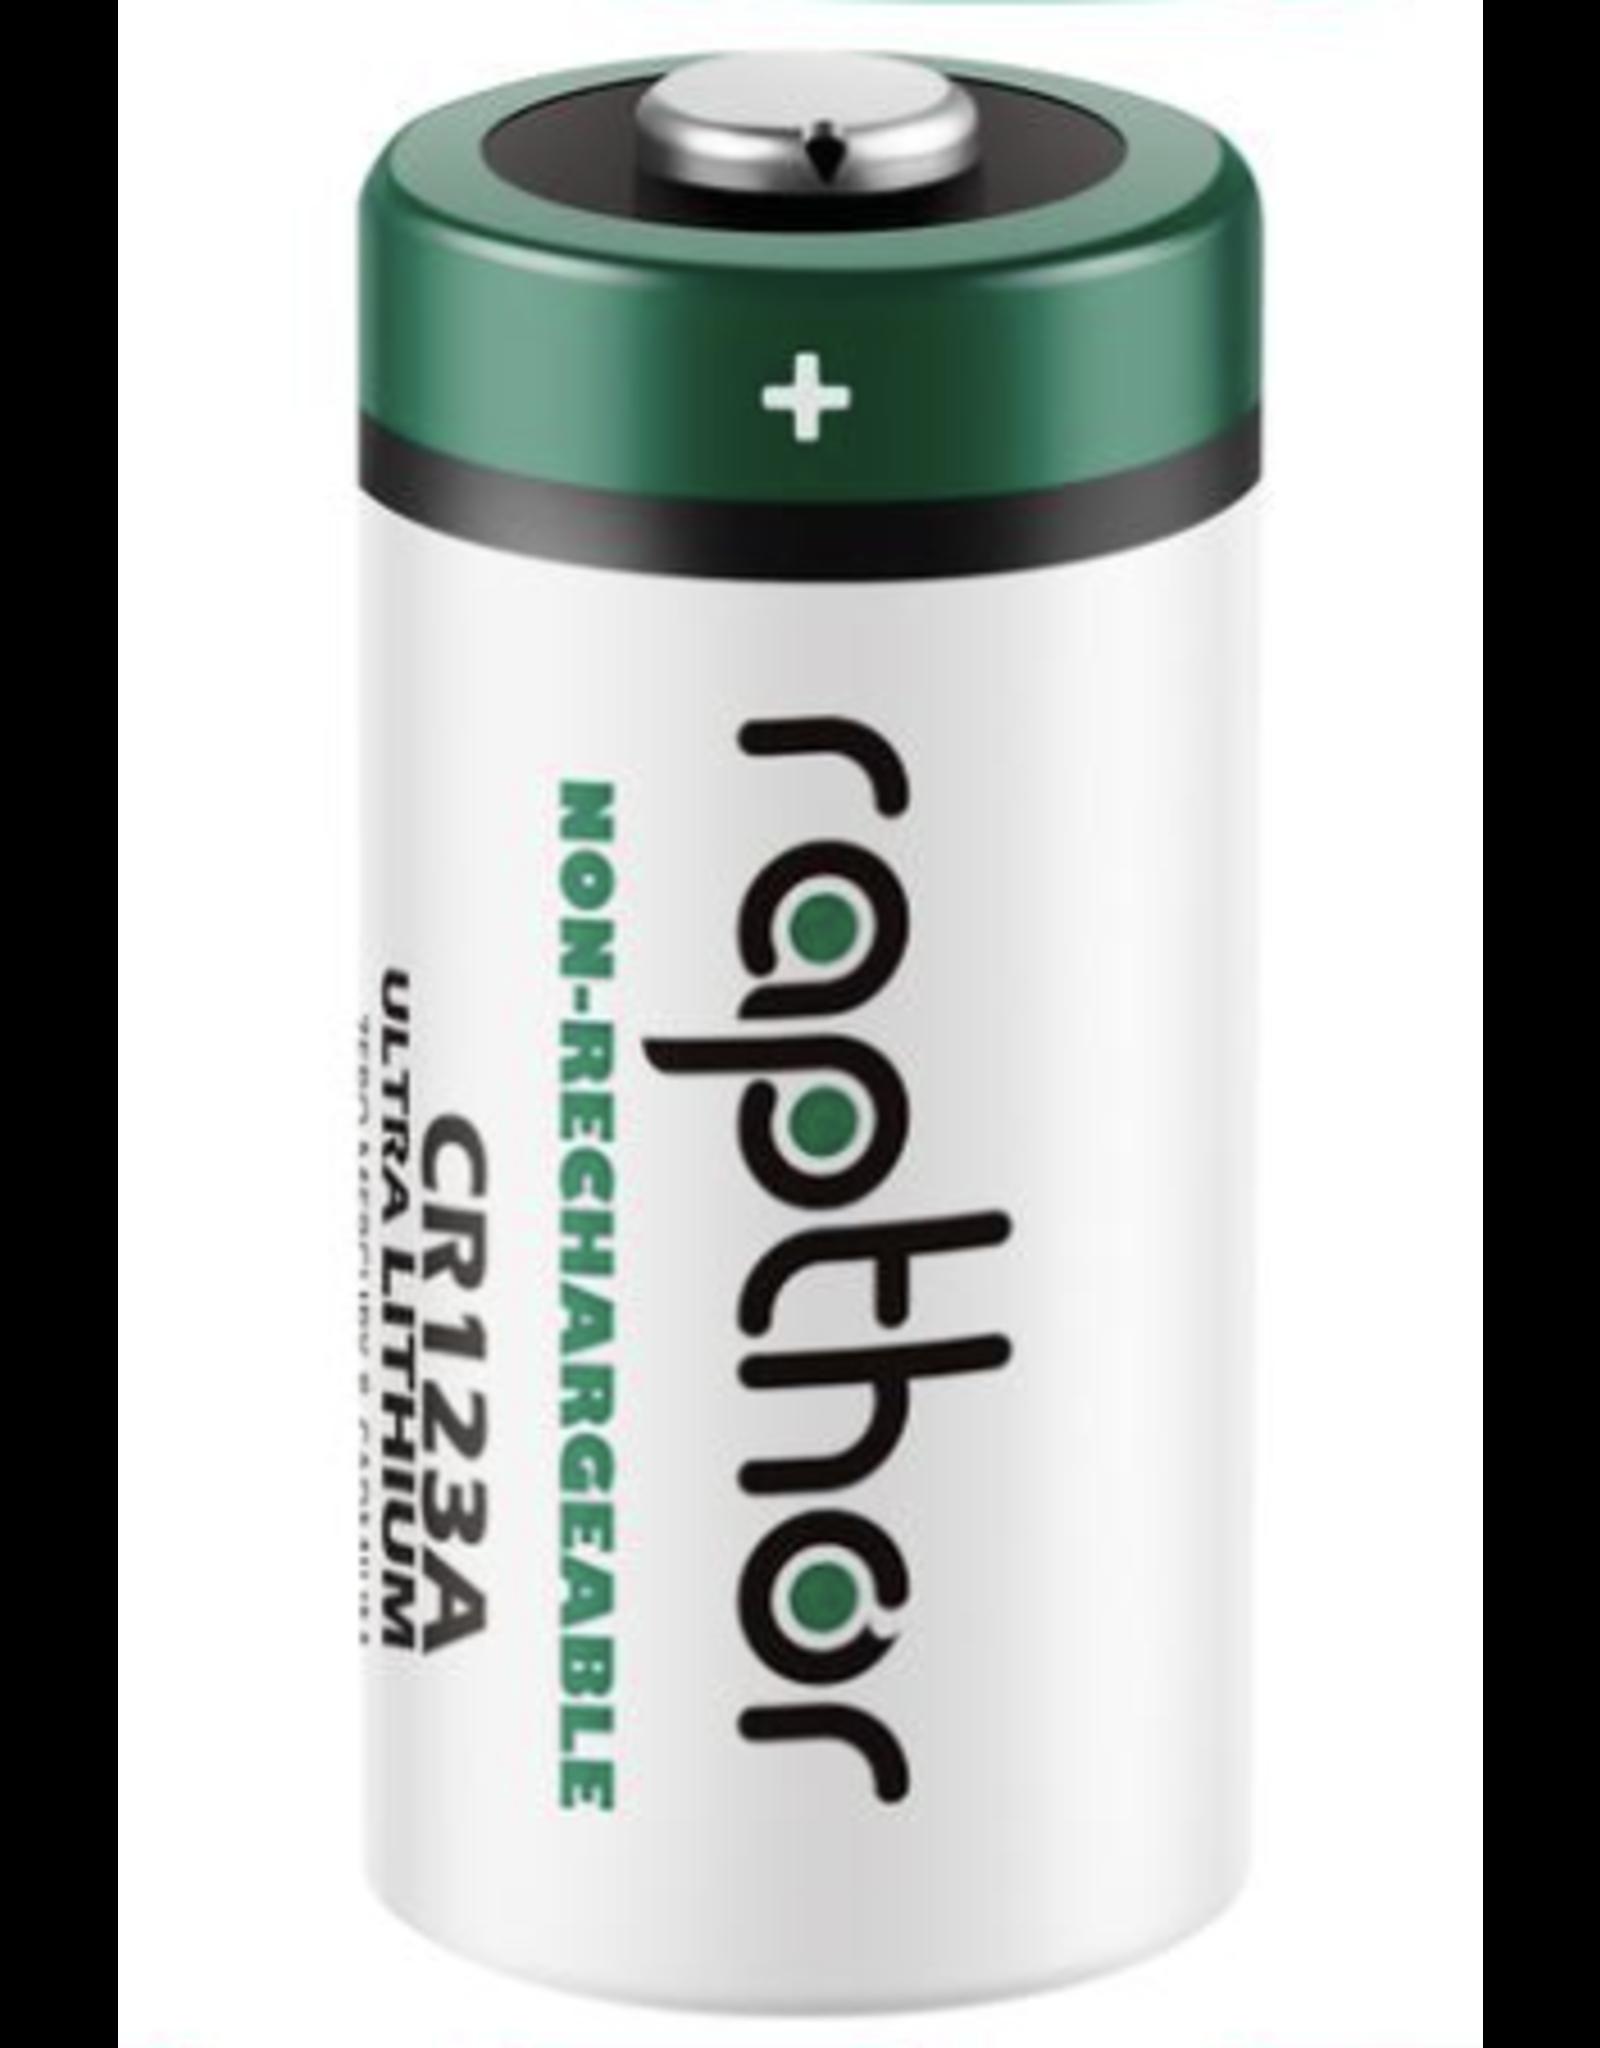 Rapthor Rapthor CR123A 3V. Lithium Battery (no packaging)